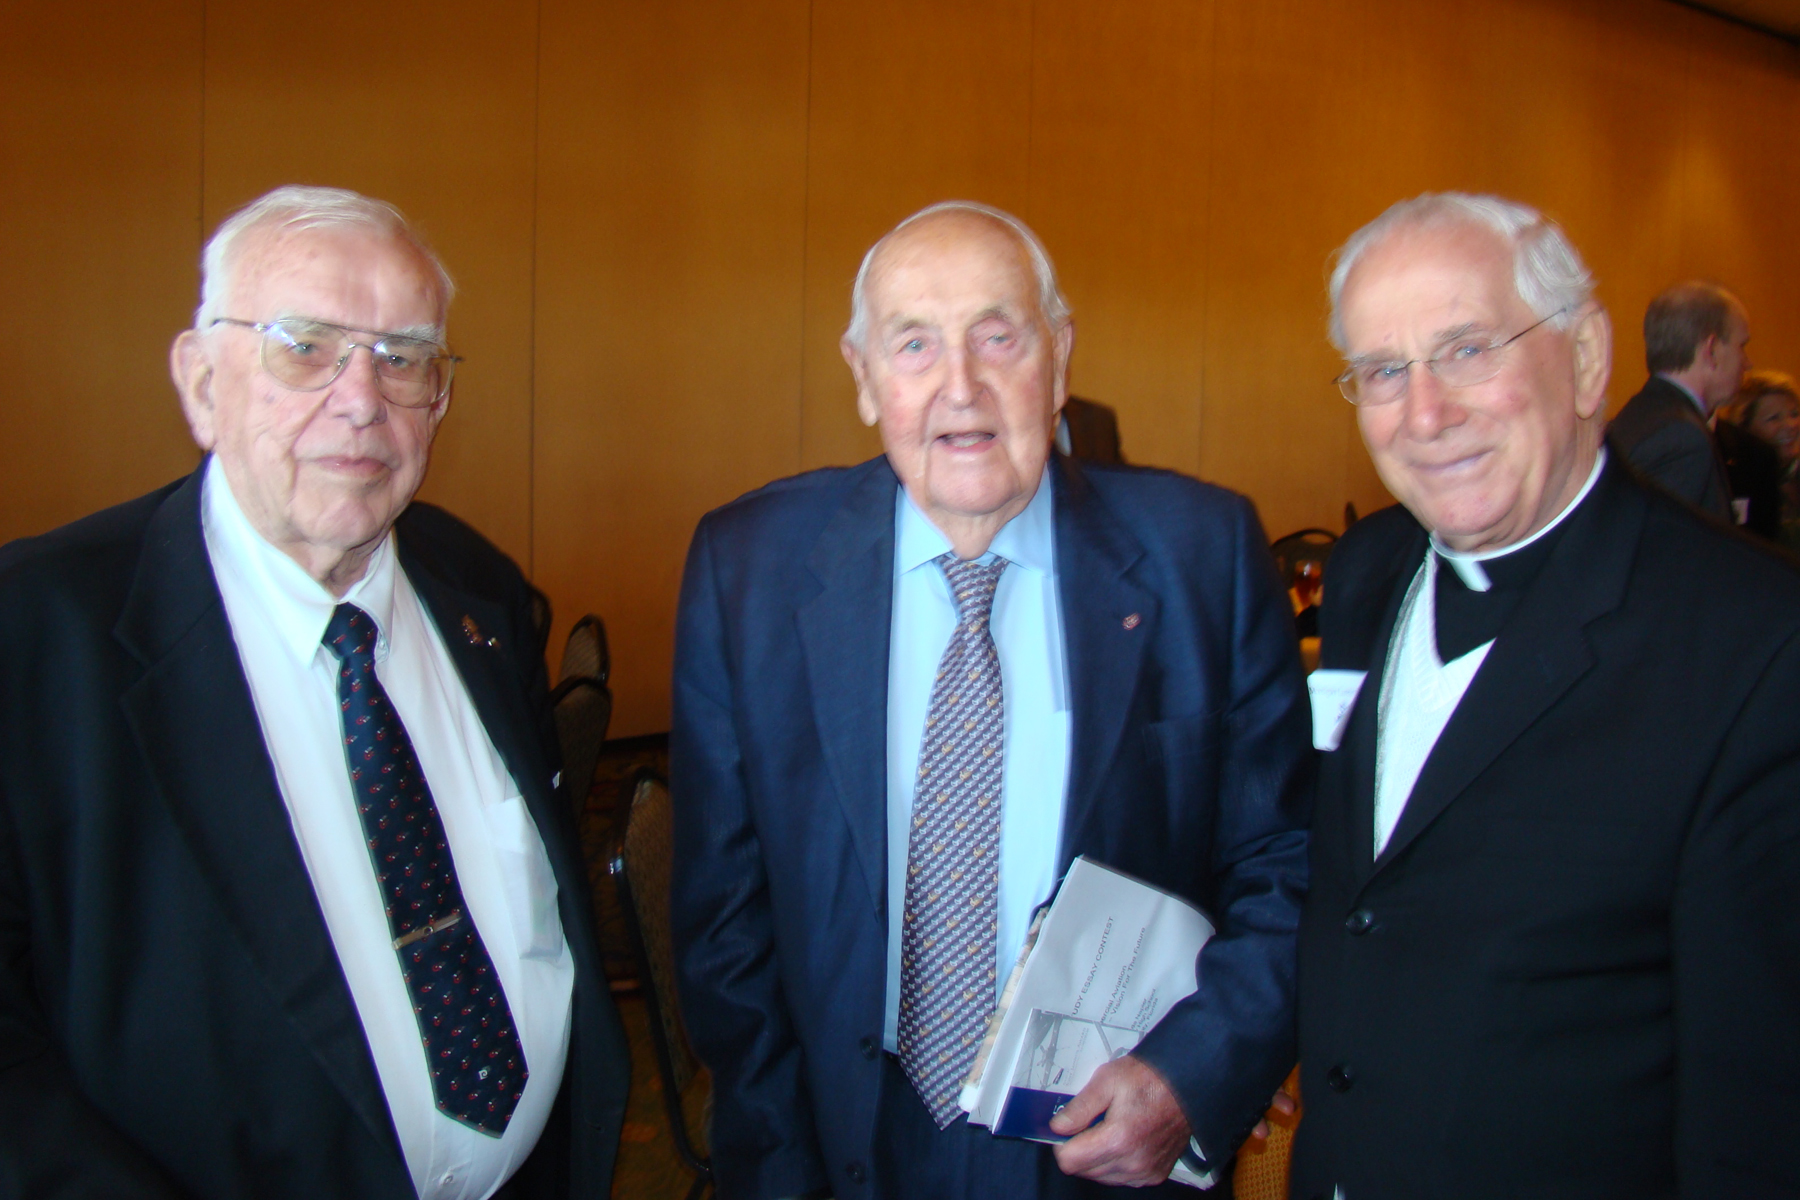 Sir Lennox Hewitt, Monsignor Higgins & Bob Cutler - 2, 30 Oct '08.jpg